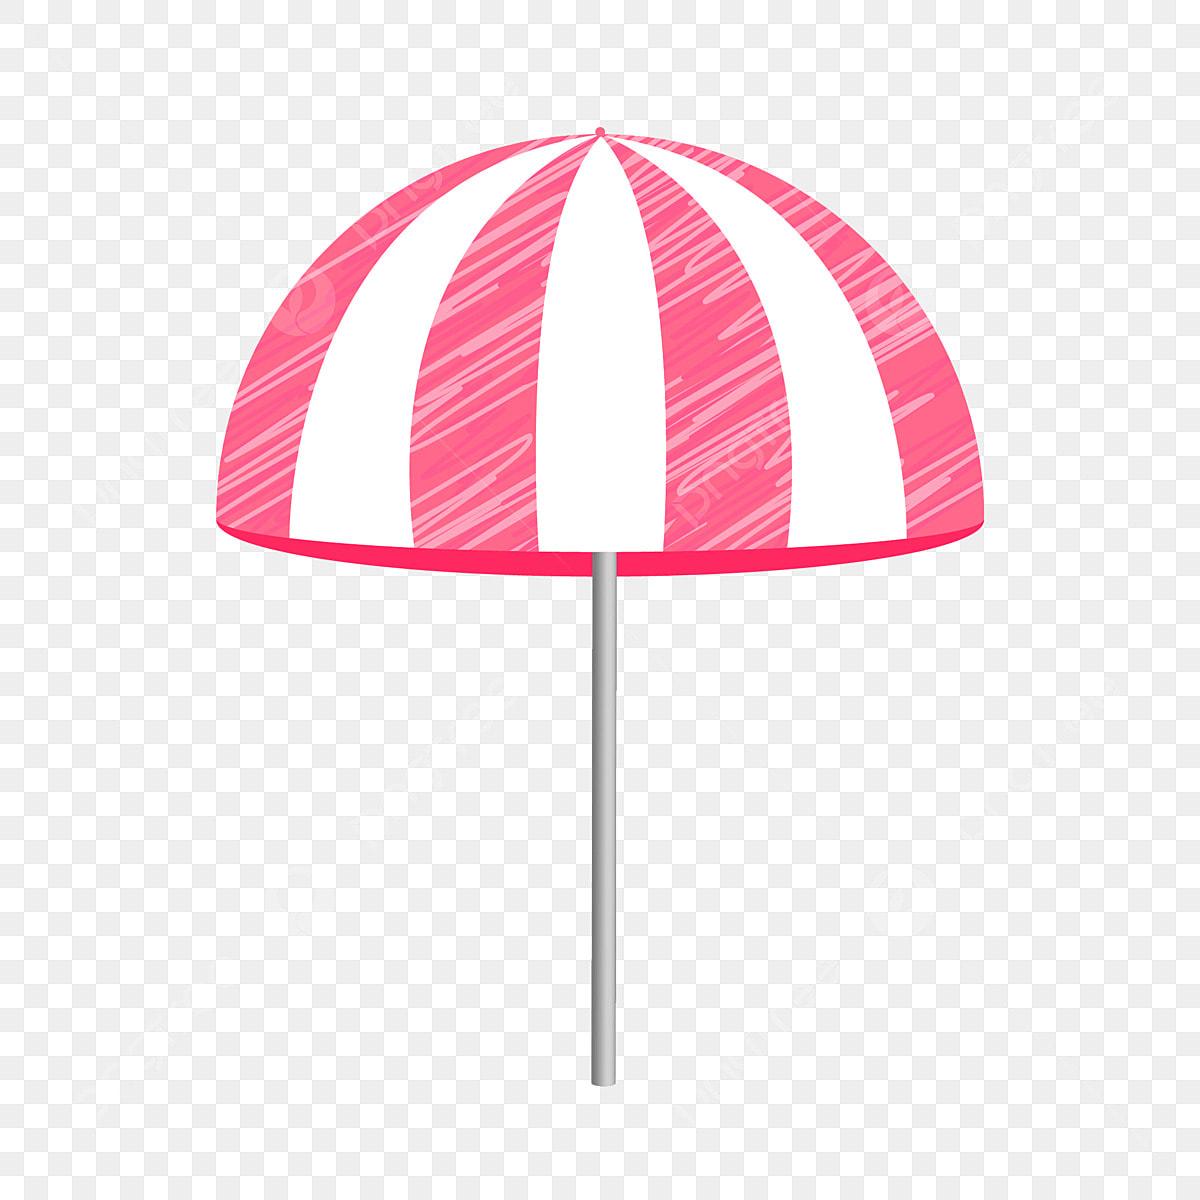 Pink Outdoor Umbrella Restaurant Umbrellas Beautiful Light Umbrellas Large Open Umbrellas Png And Vector With Transparent Background For Free Download